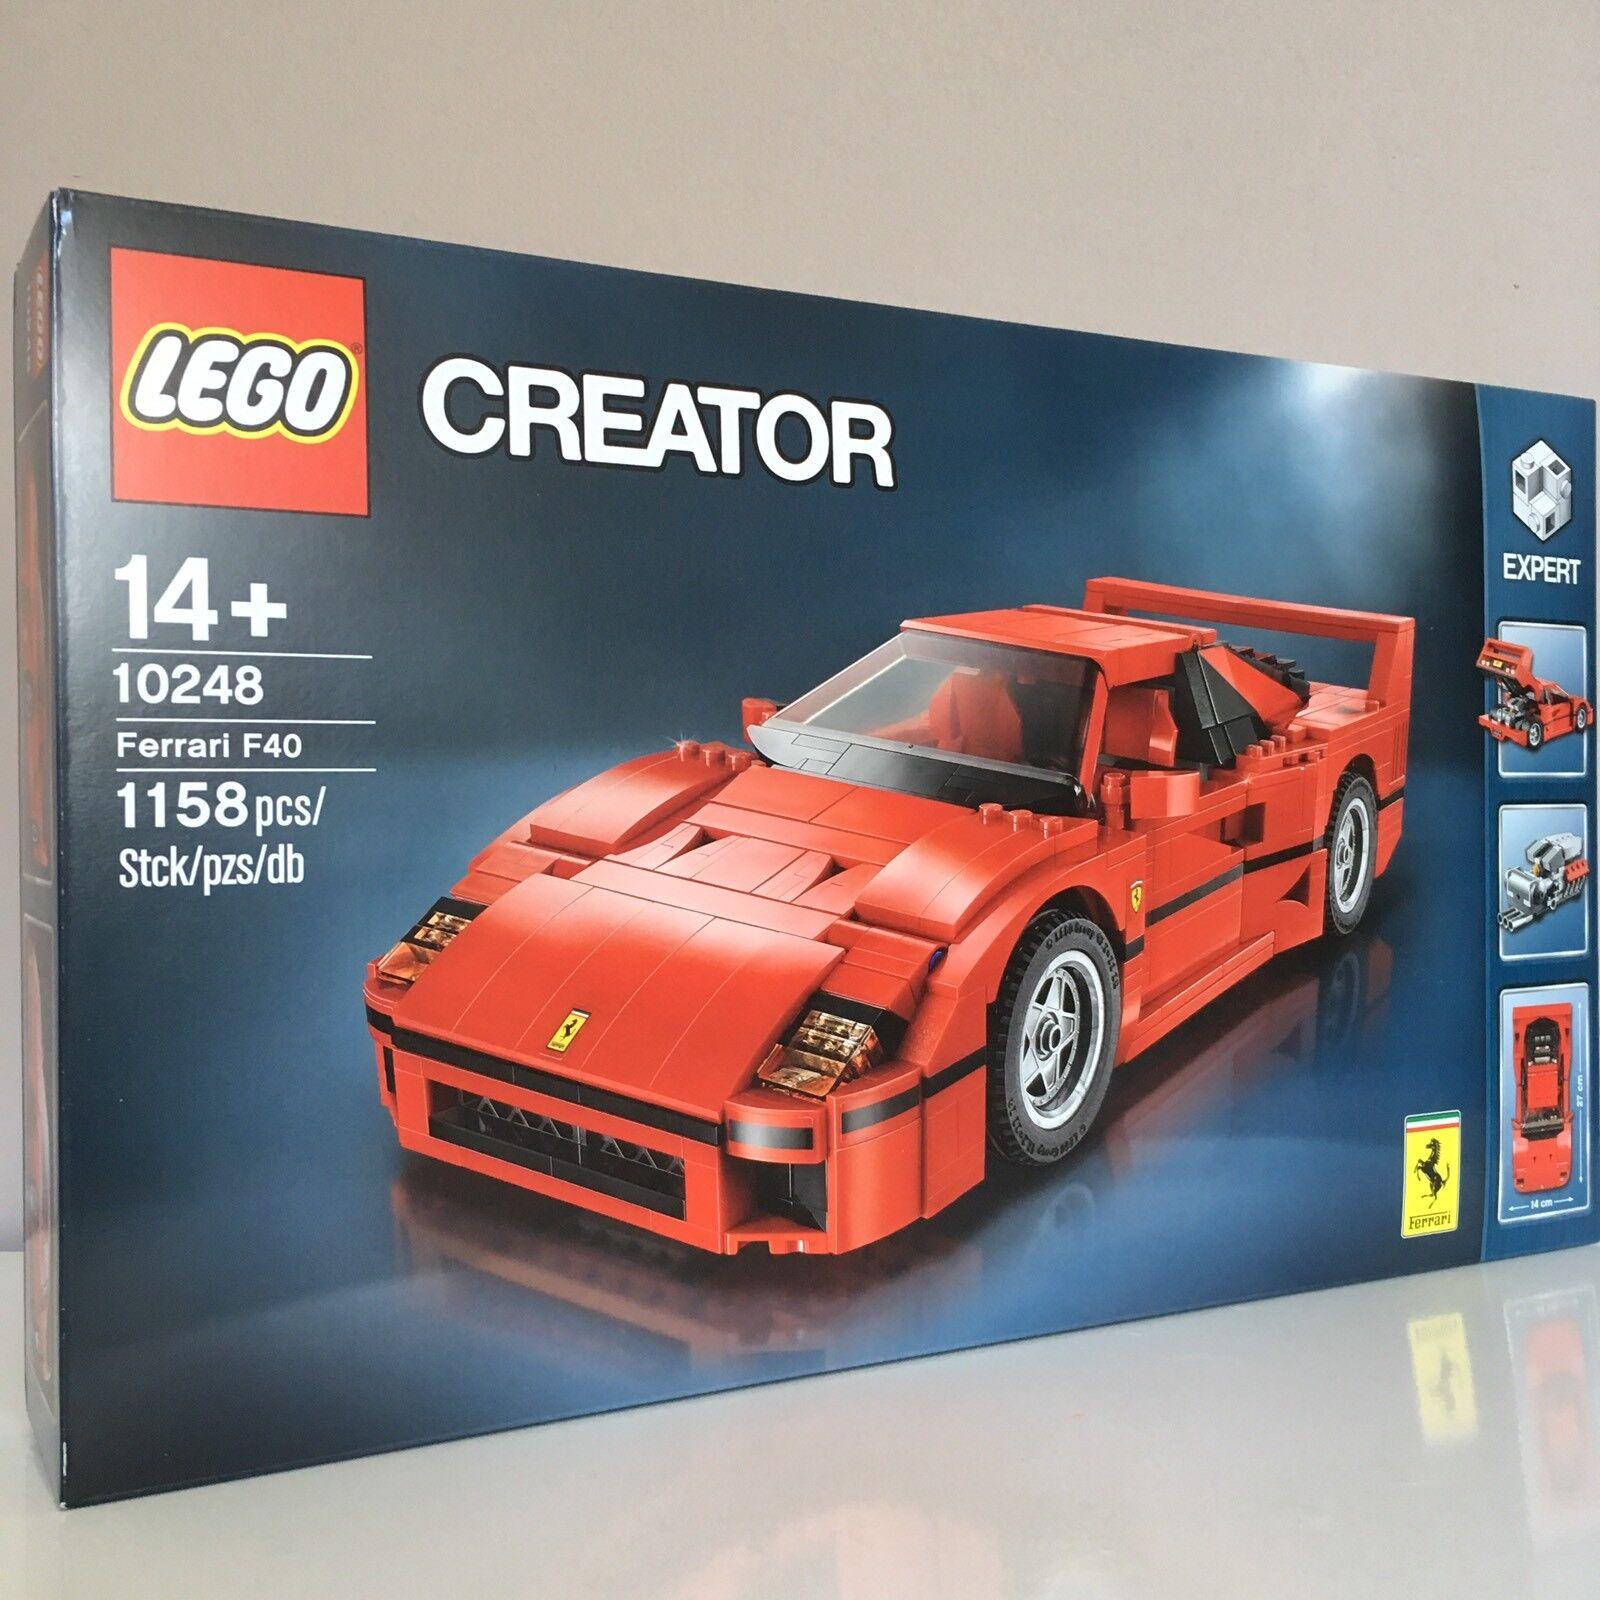 Lego 10248 Creator Expert Ferrari F40 - Brand New and Sealed